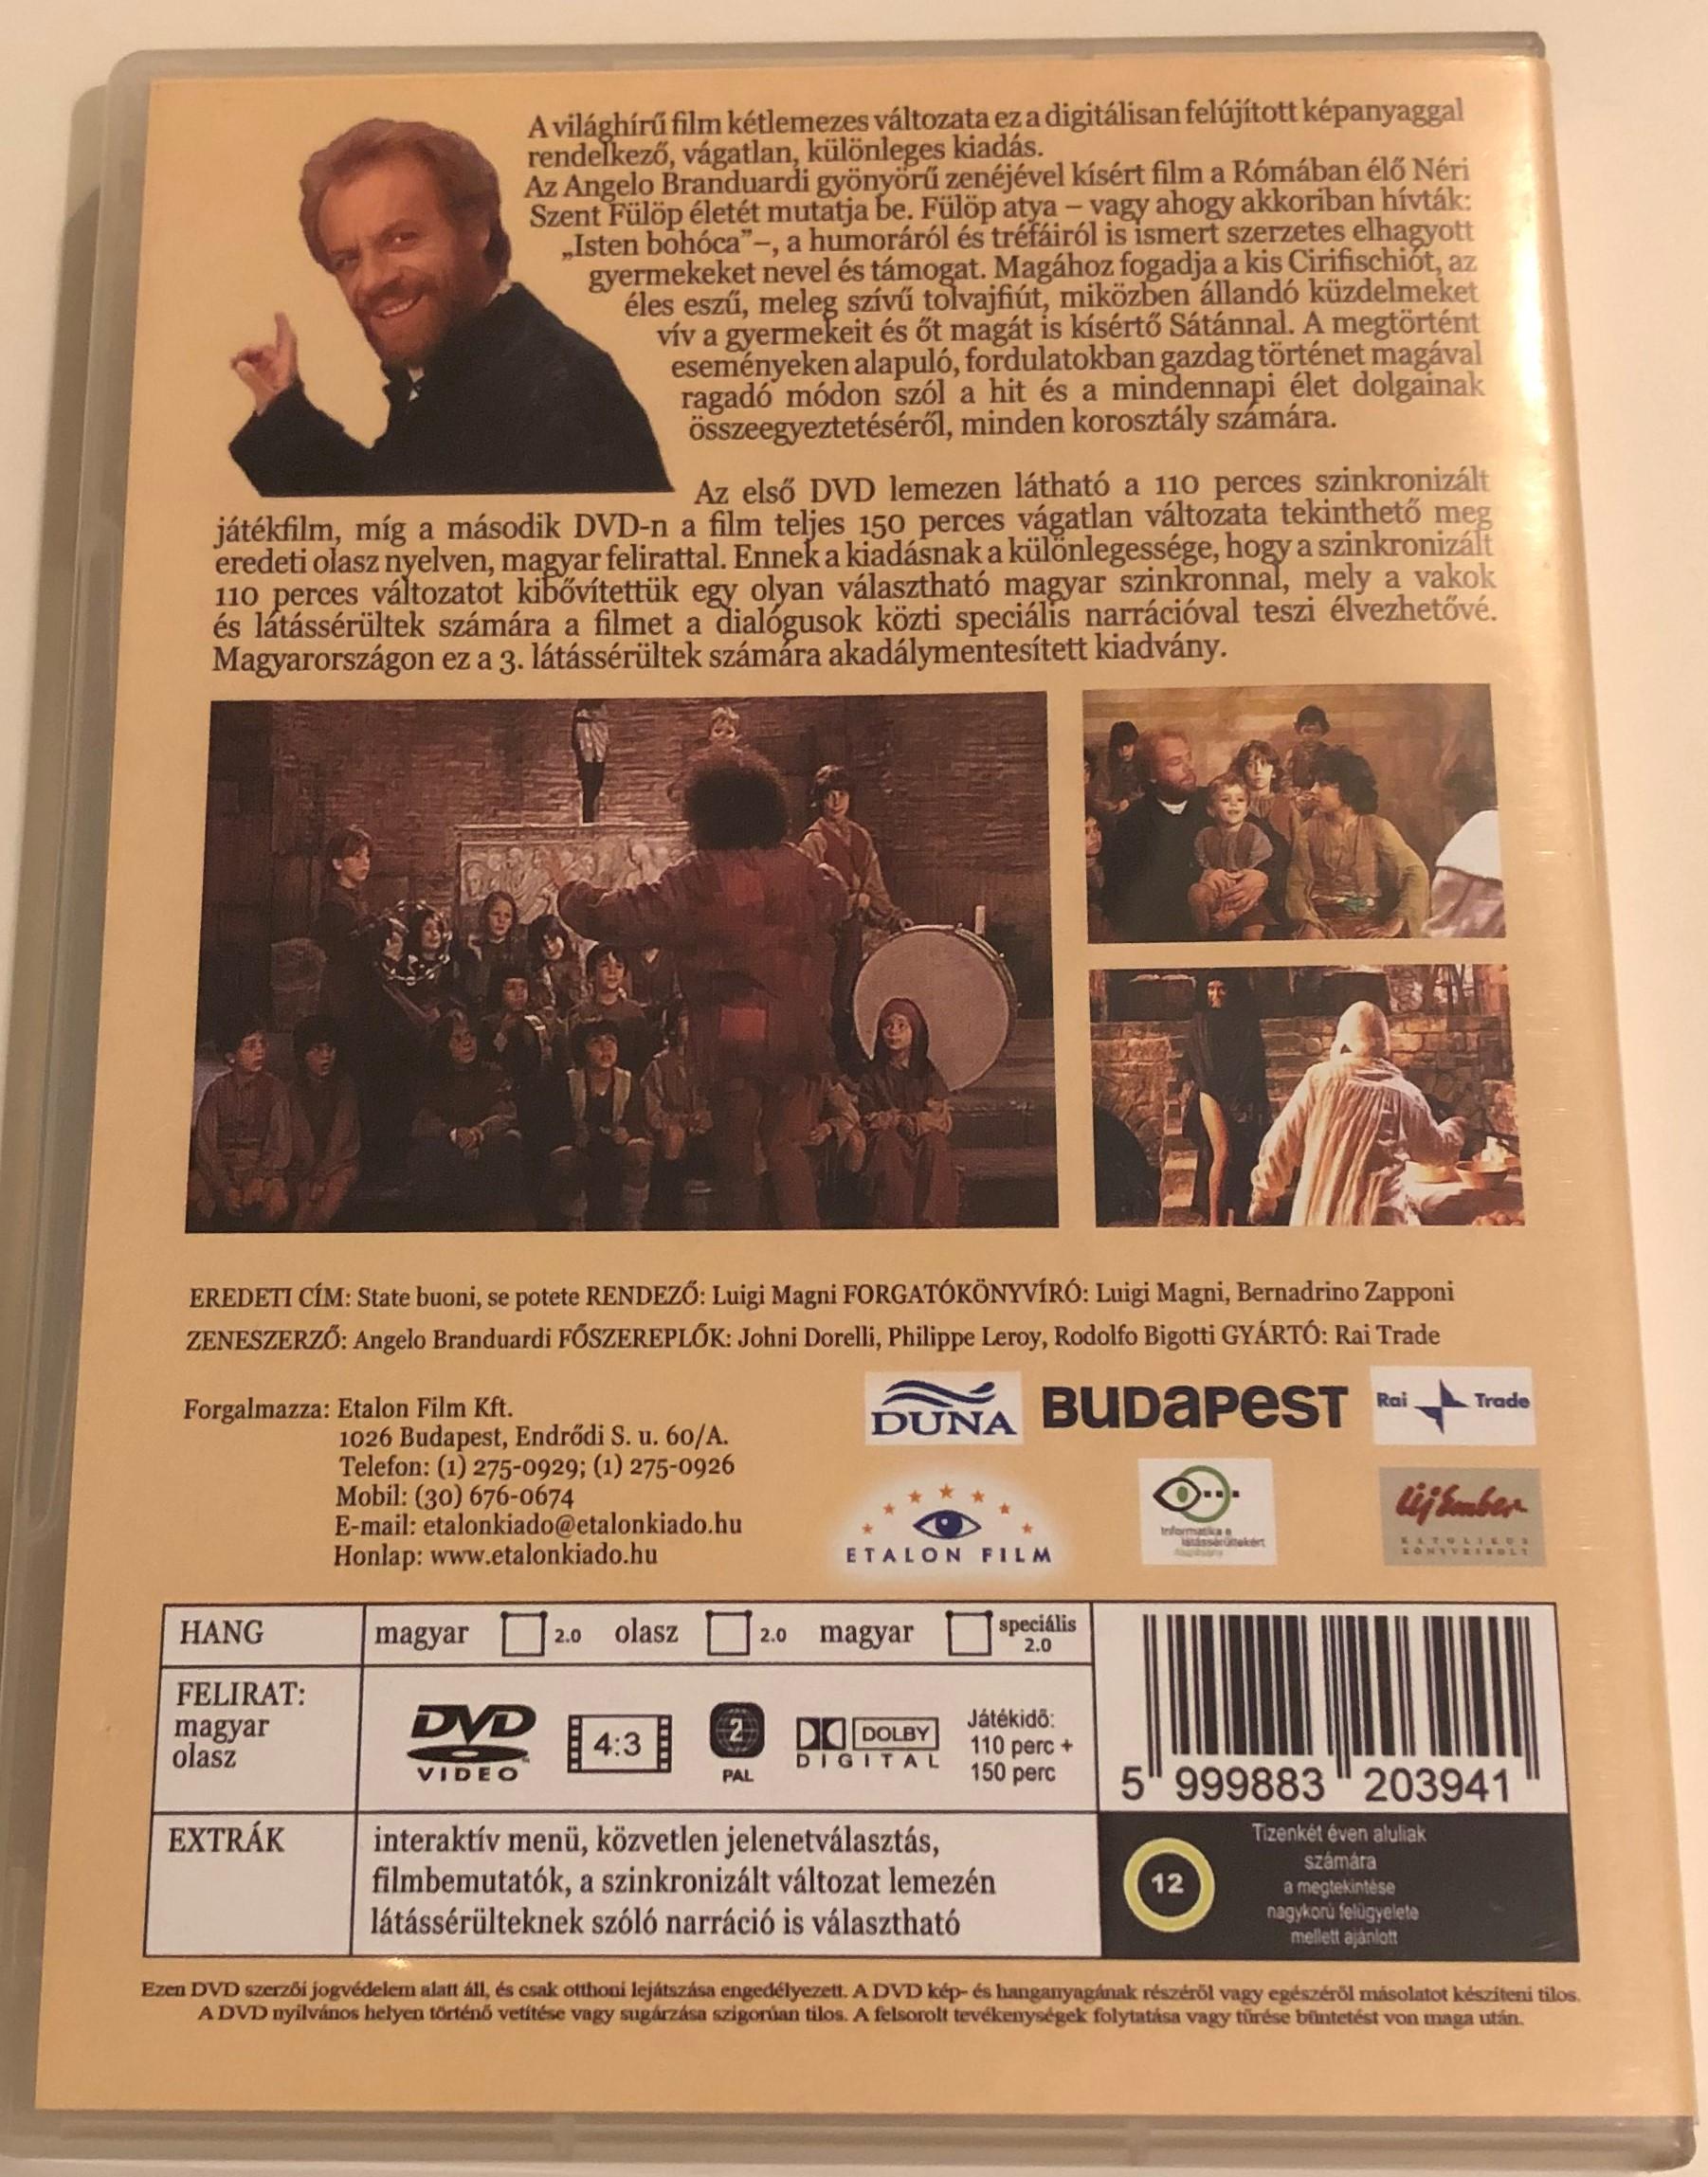 state-buoni-se-potete-dvd-3.jpg